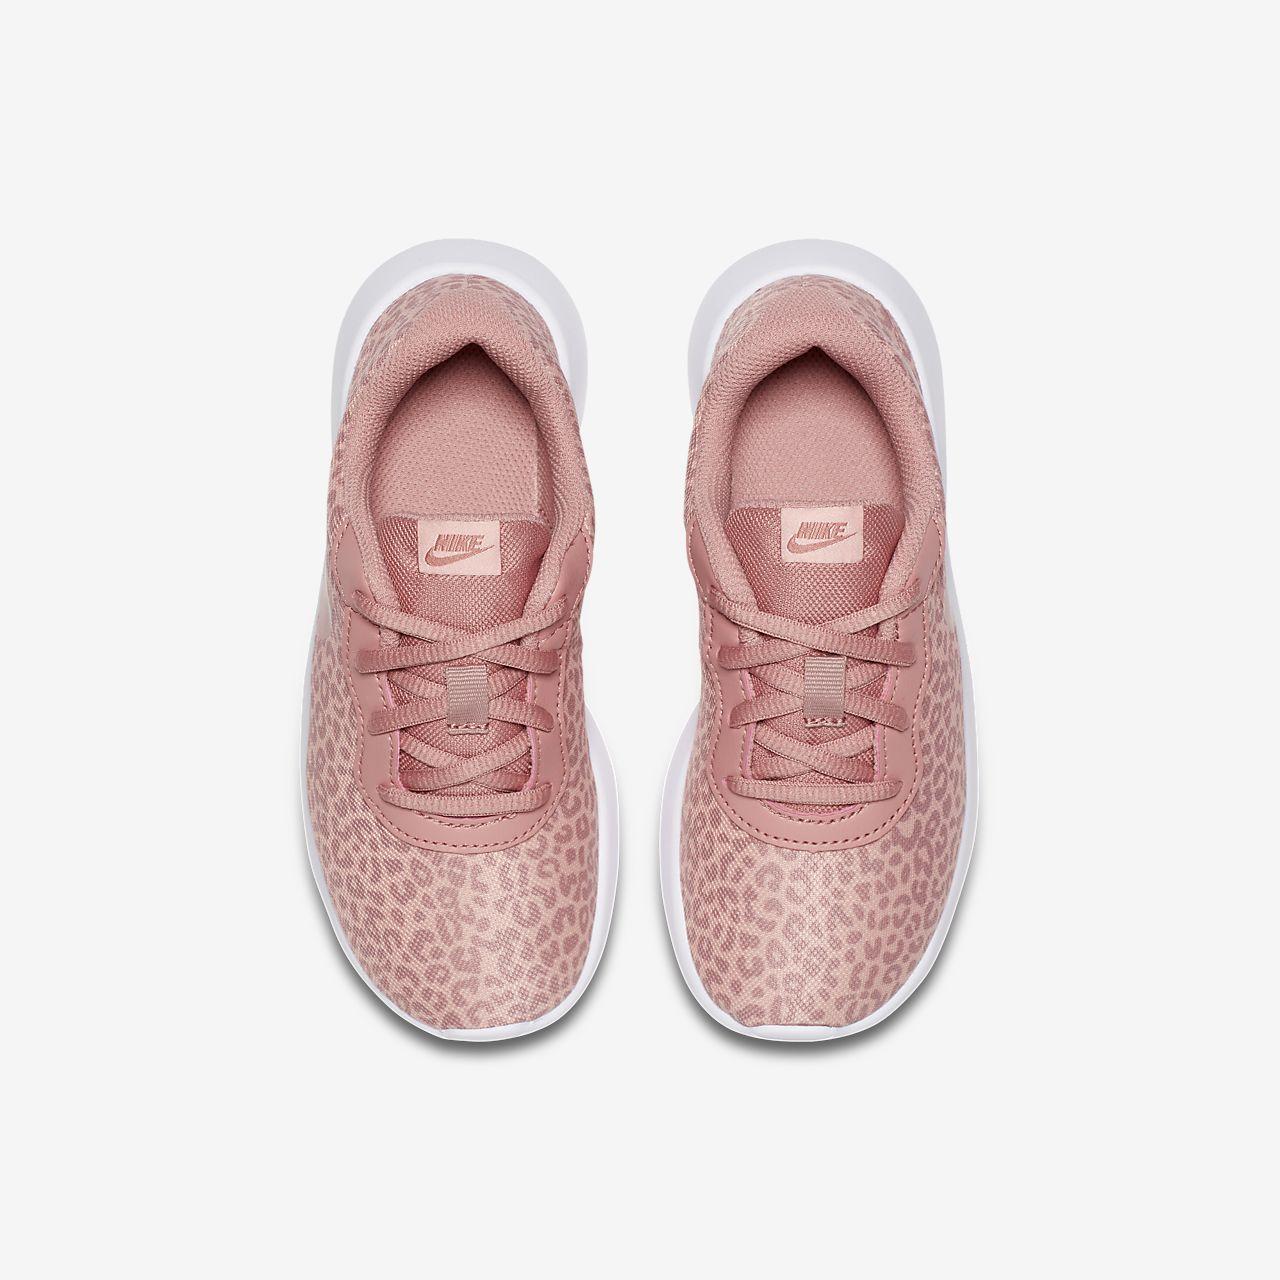 nike tanjun print shoes nz